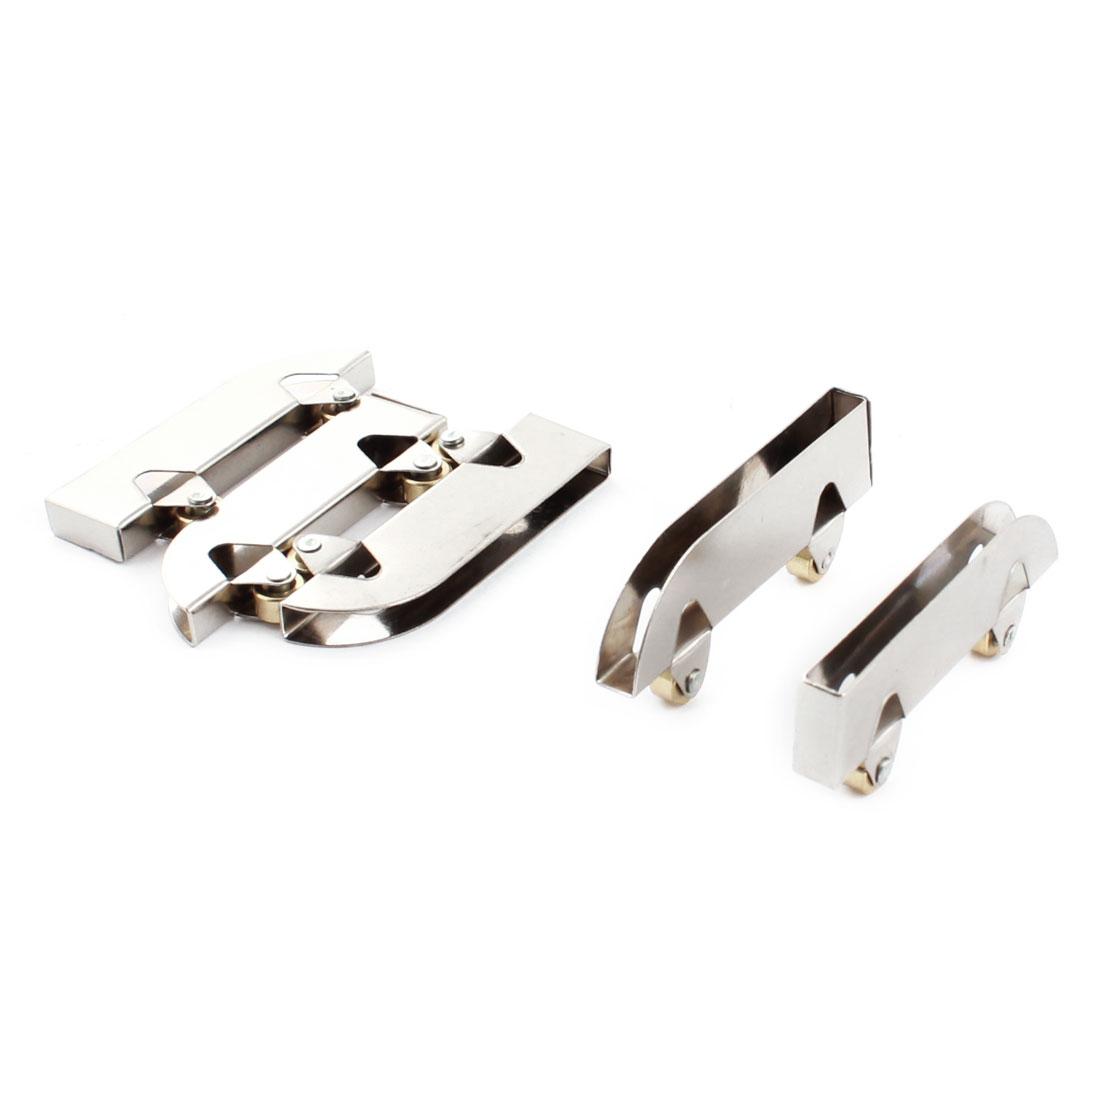 5 Pcs 7mm Diameter Wheel Closet Wardrobe Closet Sliding Glass Door Roller